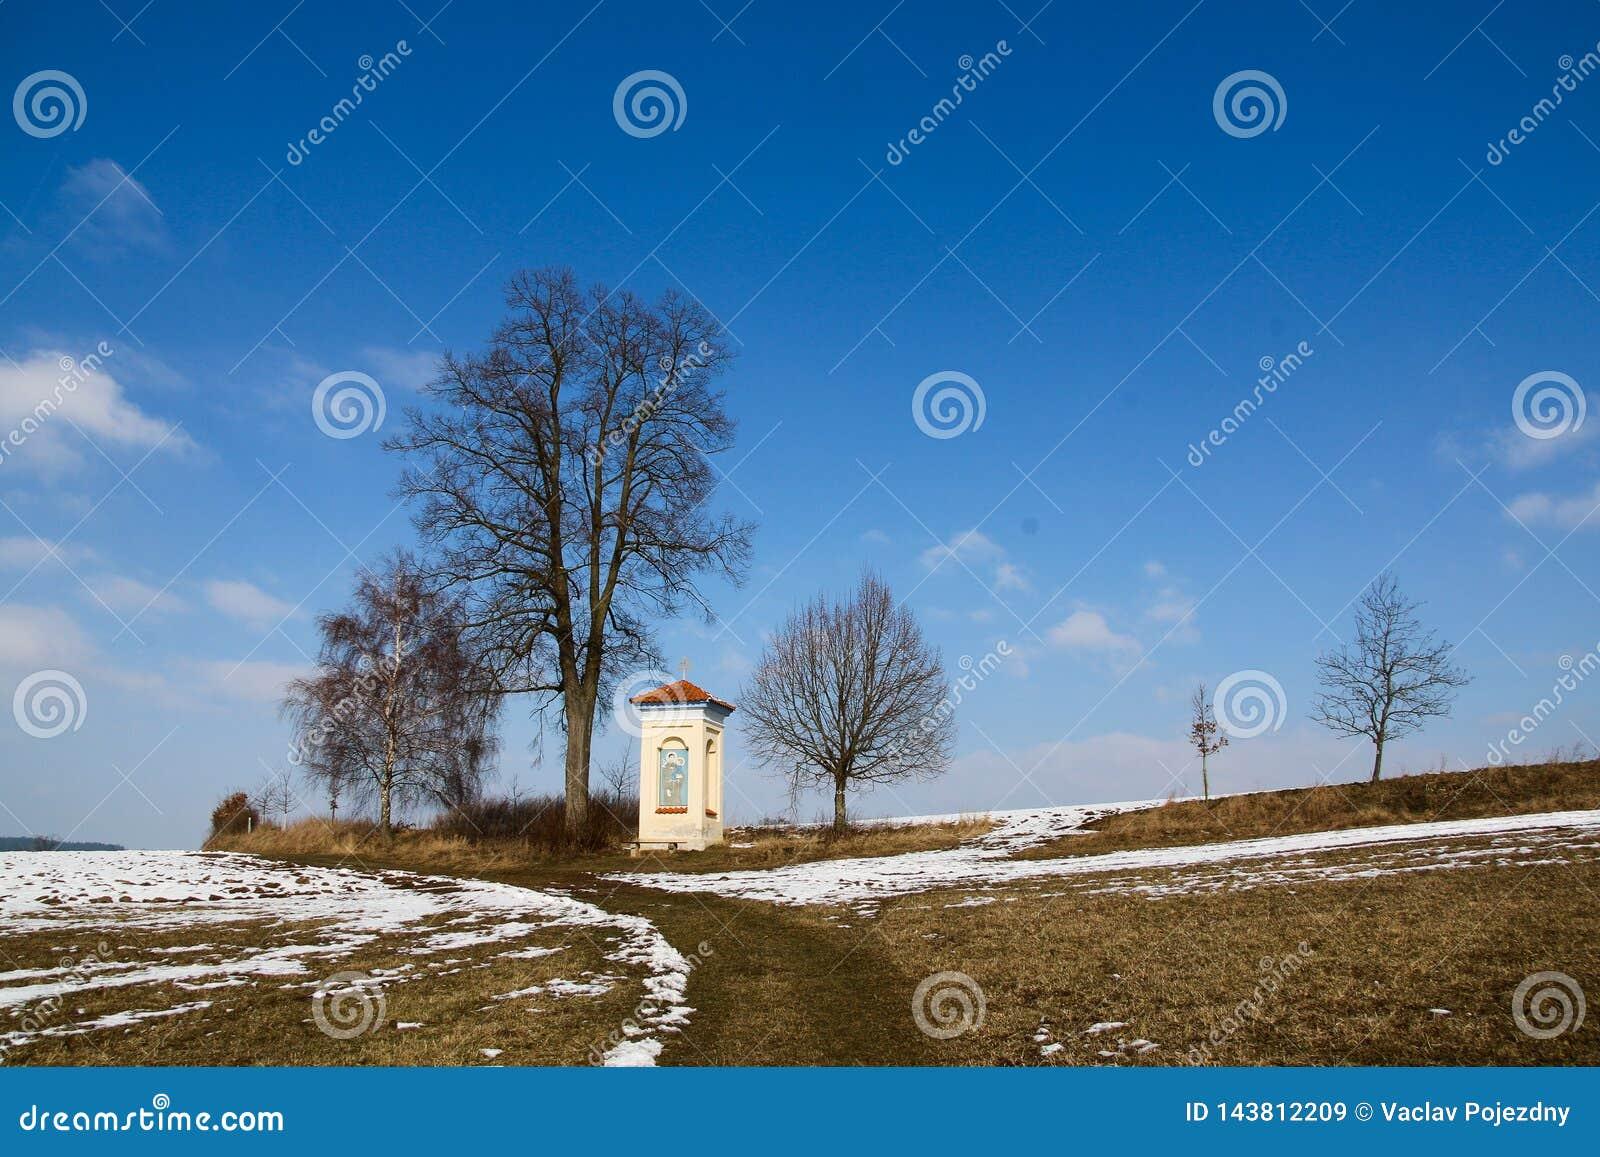 Chapel hill by a tree